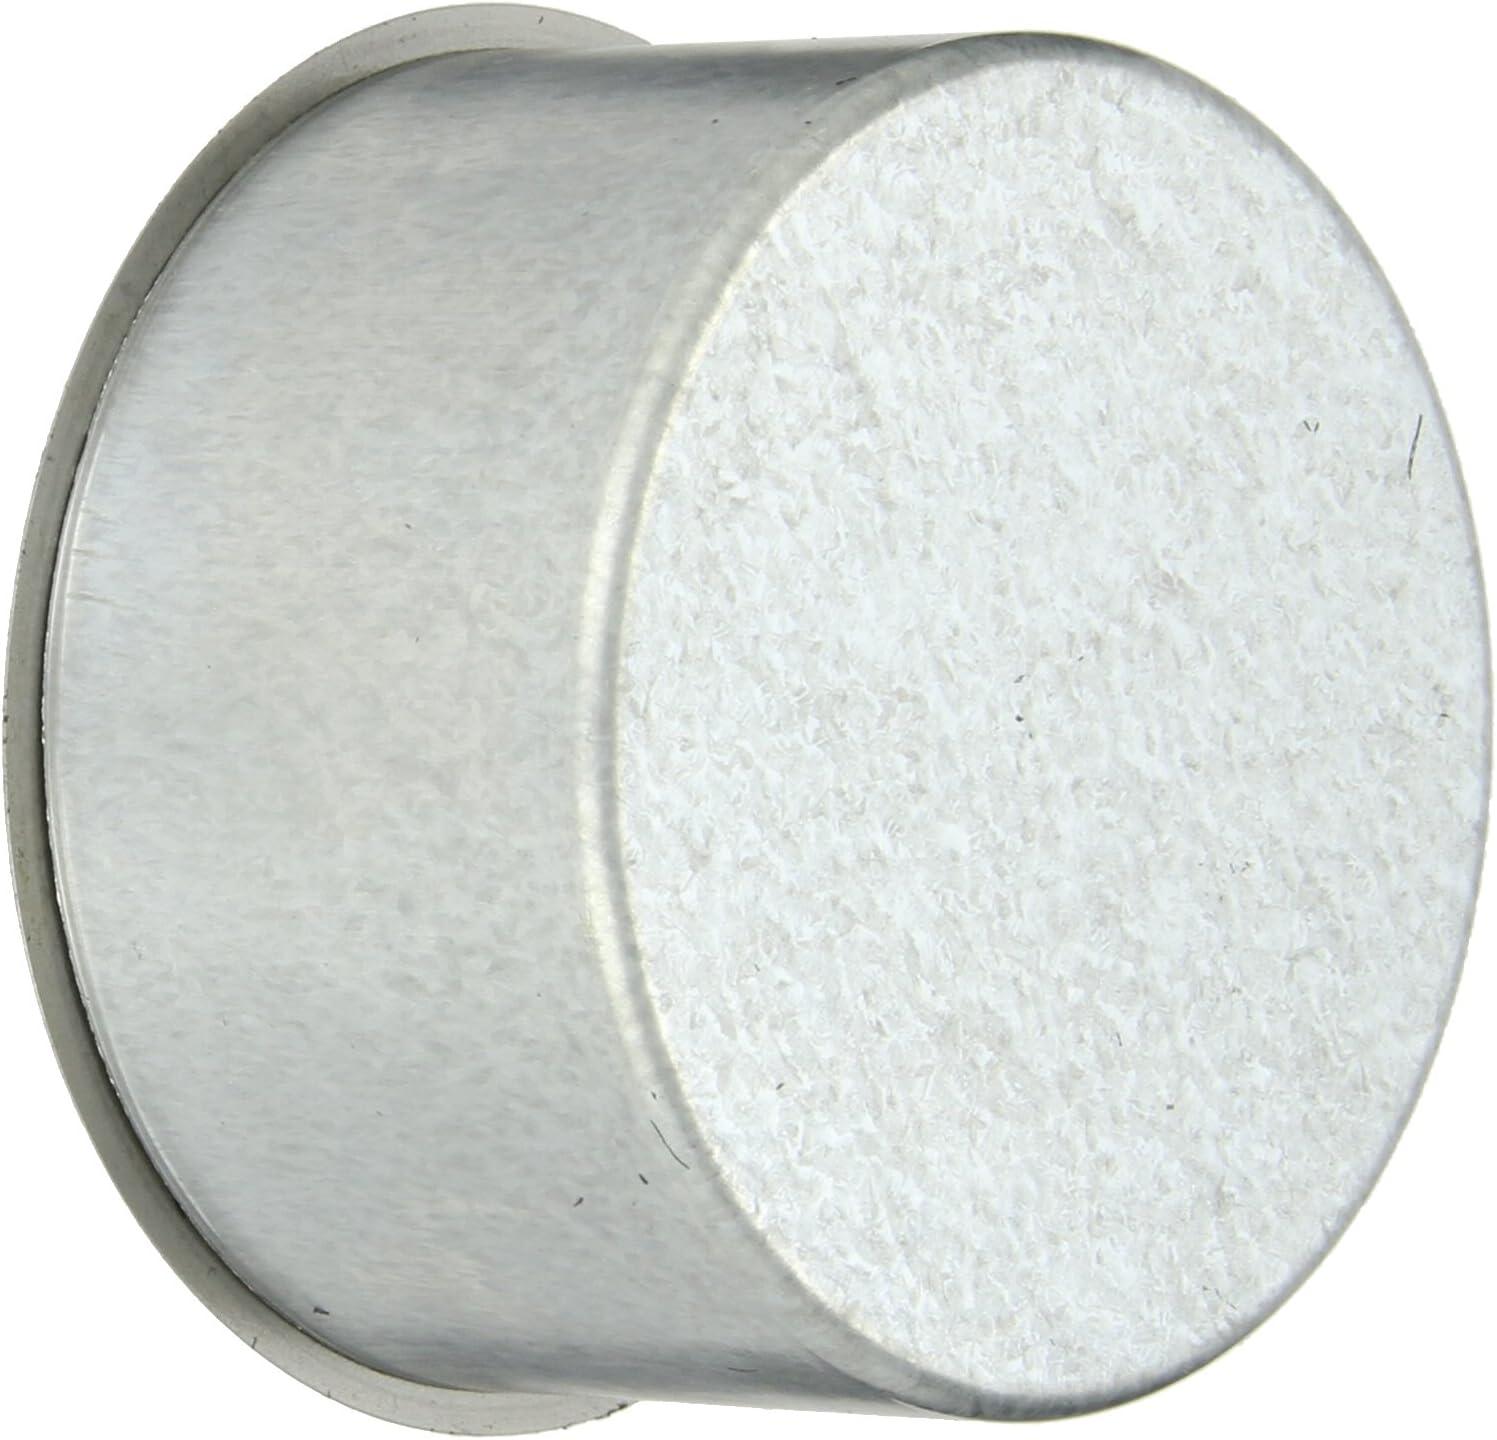 SKF 99354 Speedi Sleeve, SSLEEVE Style, Inch, 3.543in Shaft Diam